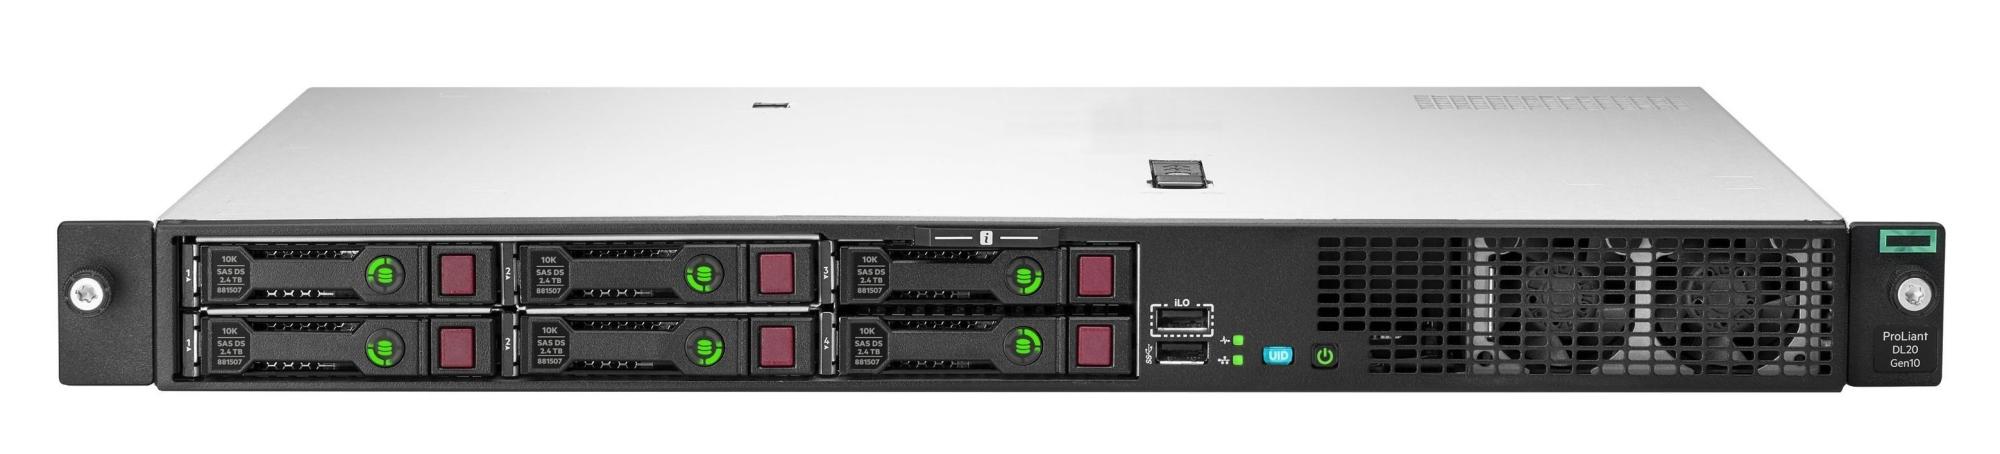 Proliant Dl20 Gen10 (perfdl20-007) + Windows Server 2019 Essentials Servidor 3,4 Ghz Intel® Xeon® Bastidor (1u) 500 W